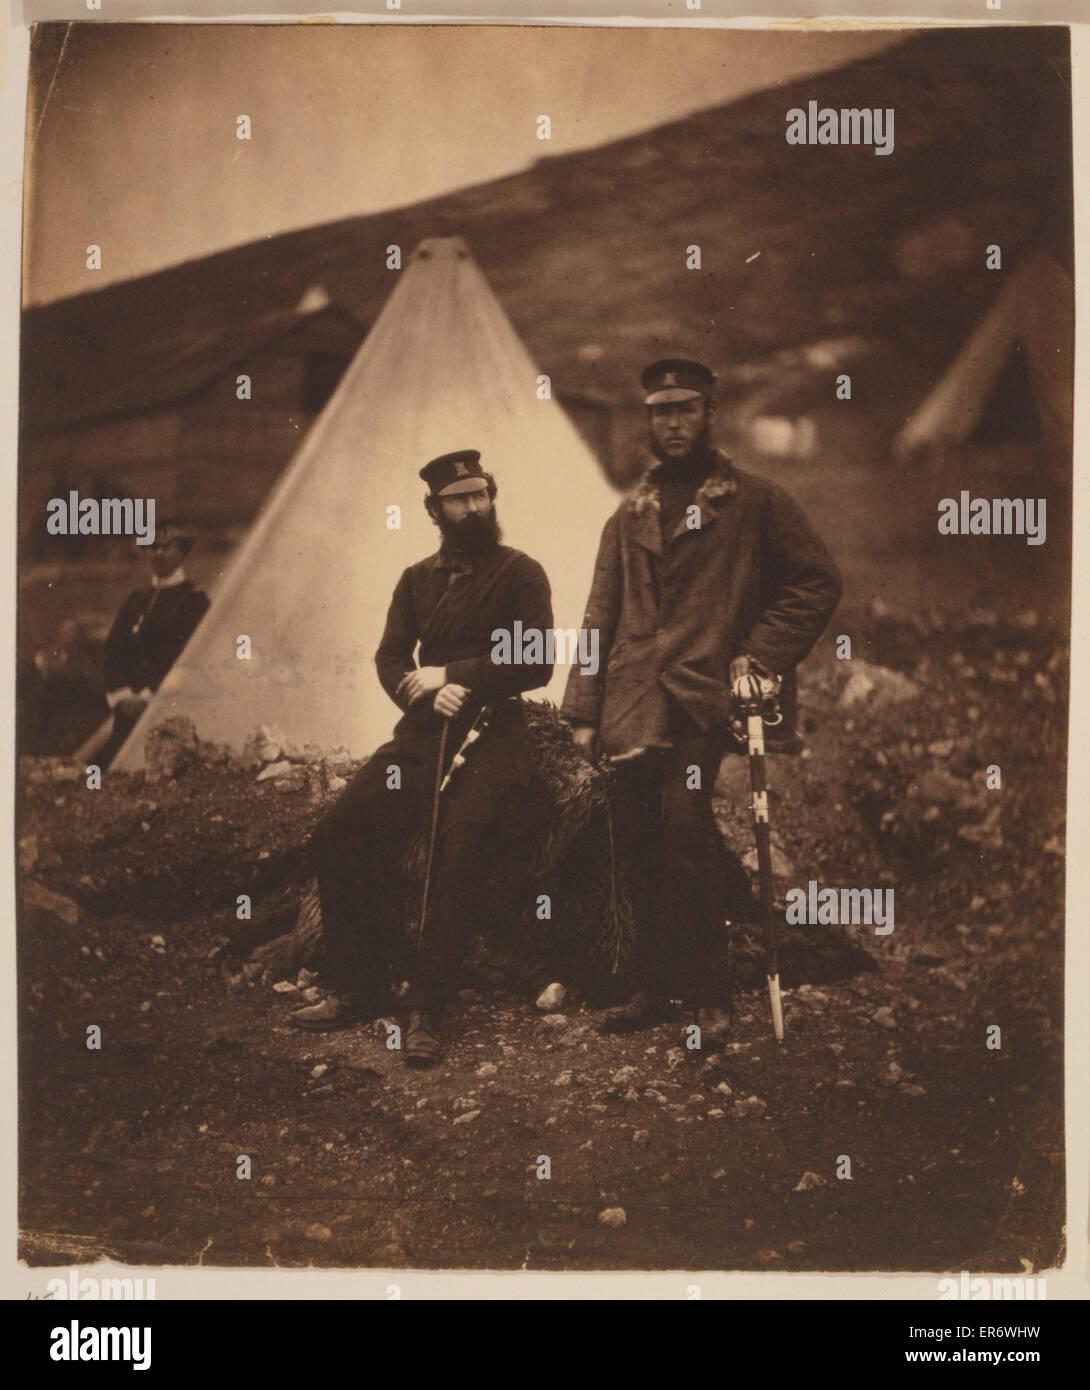 Captain Graham & Captain Macleod, 42nd Regiment. Captain Graham and Captain Macleod, one seated and one - Stock Image